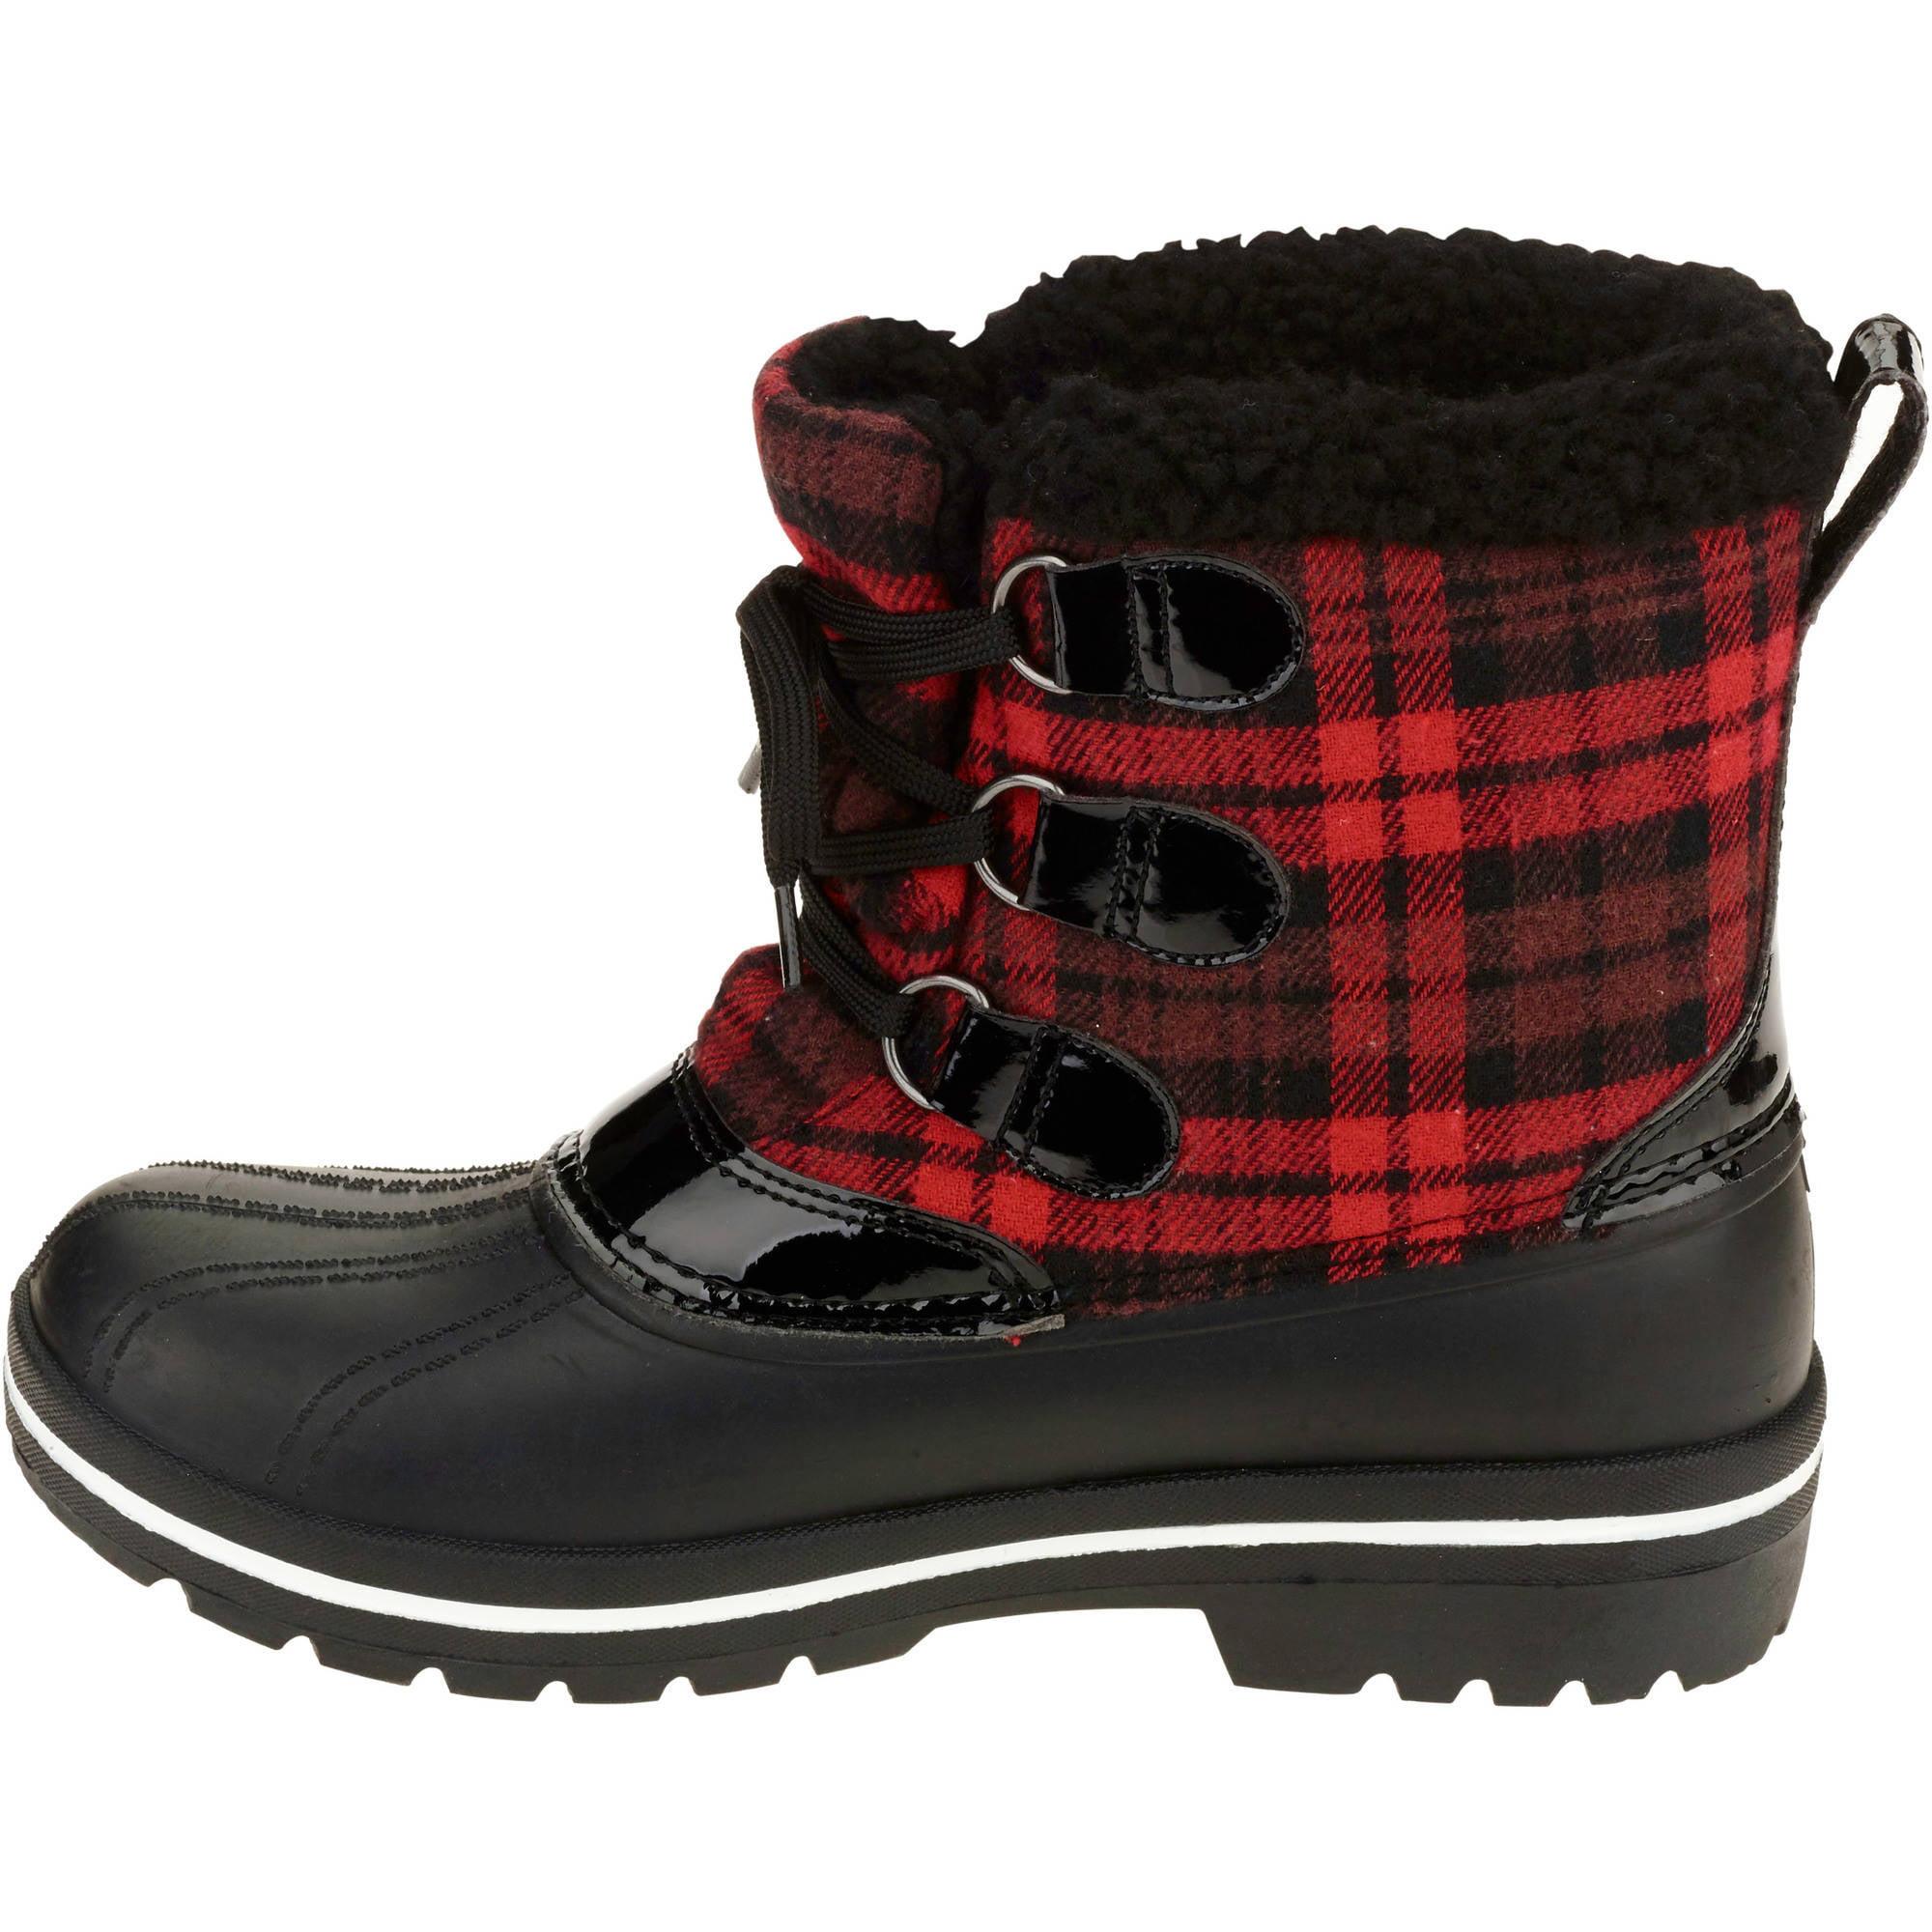 7b5ef0583e Ozark Trail - Women s Lace Up Winter Boot - Walmart.com